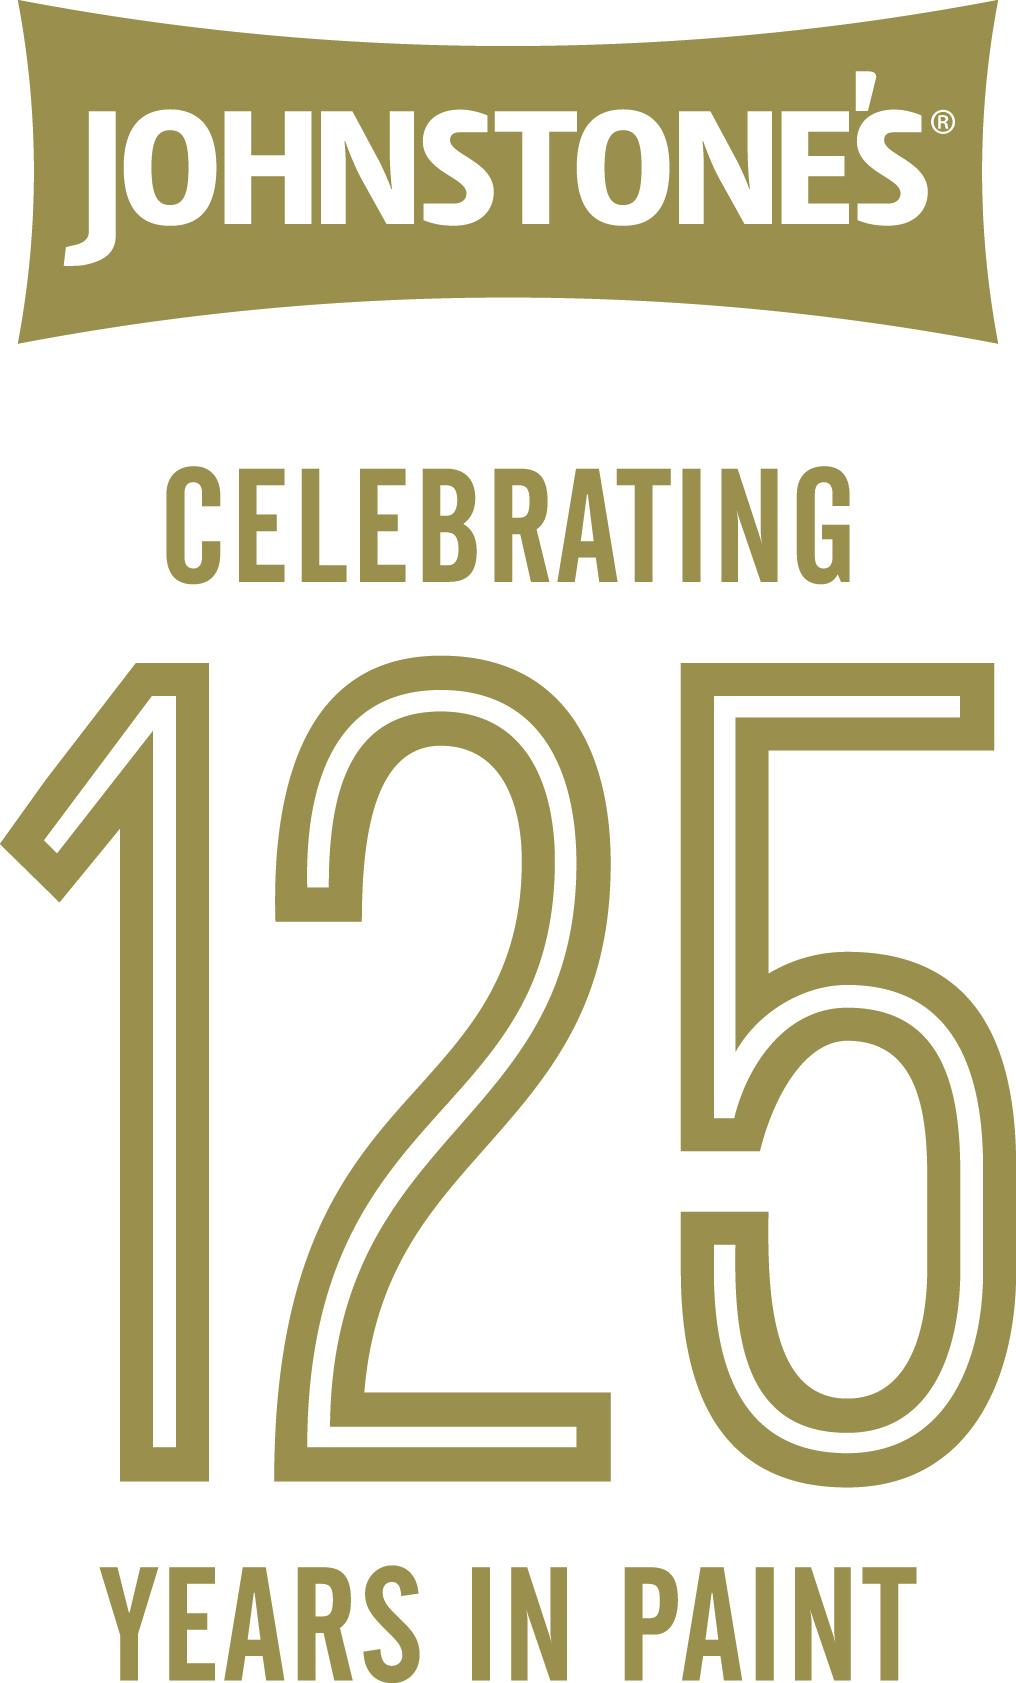 JOHNSTONE'S CELEBRATES 125 YEAR ANNIVERSARY - Archetech